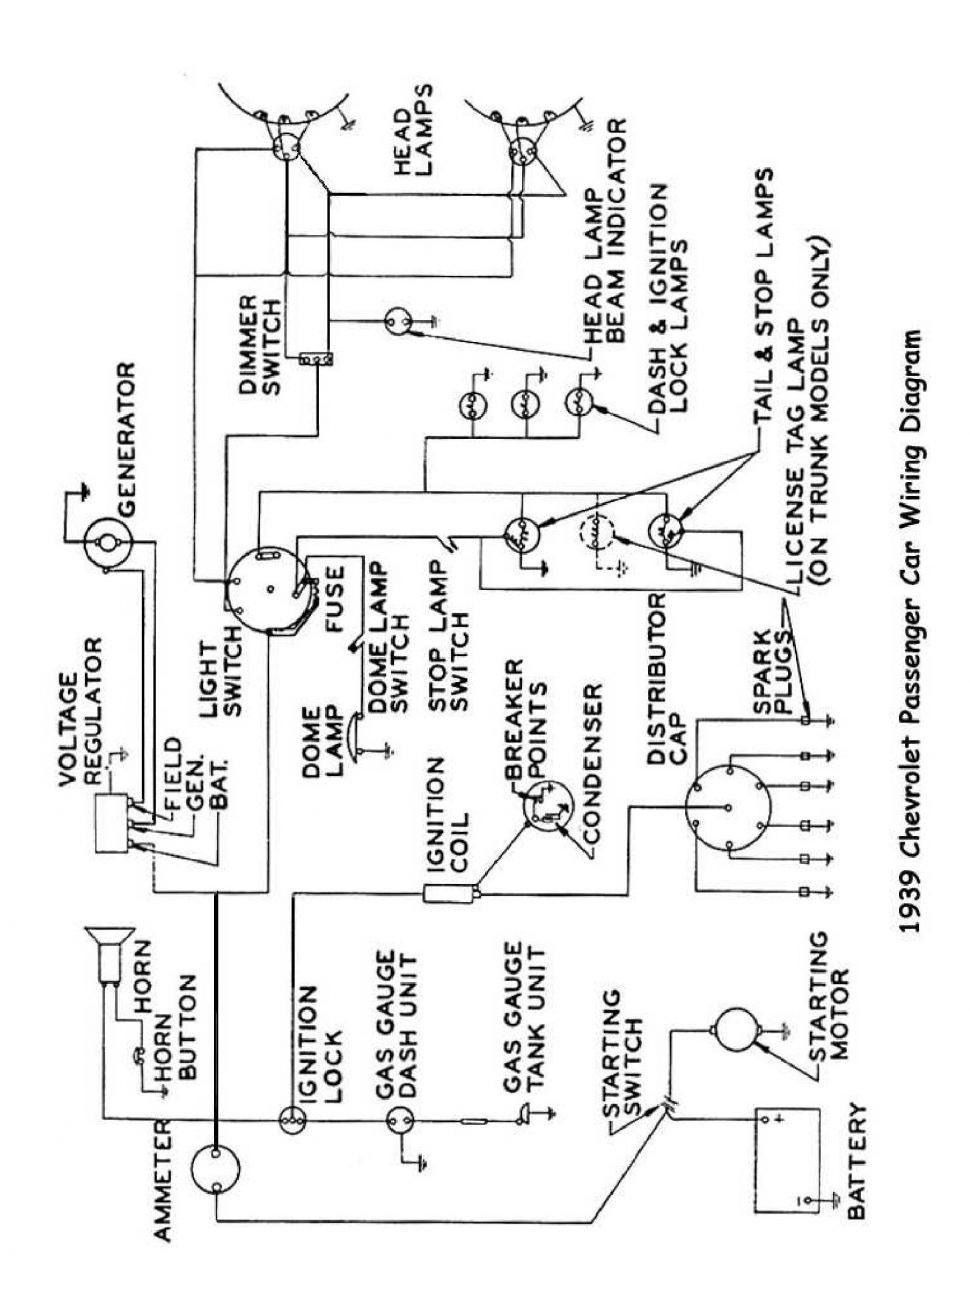 volkswagen starter wiring diagram